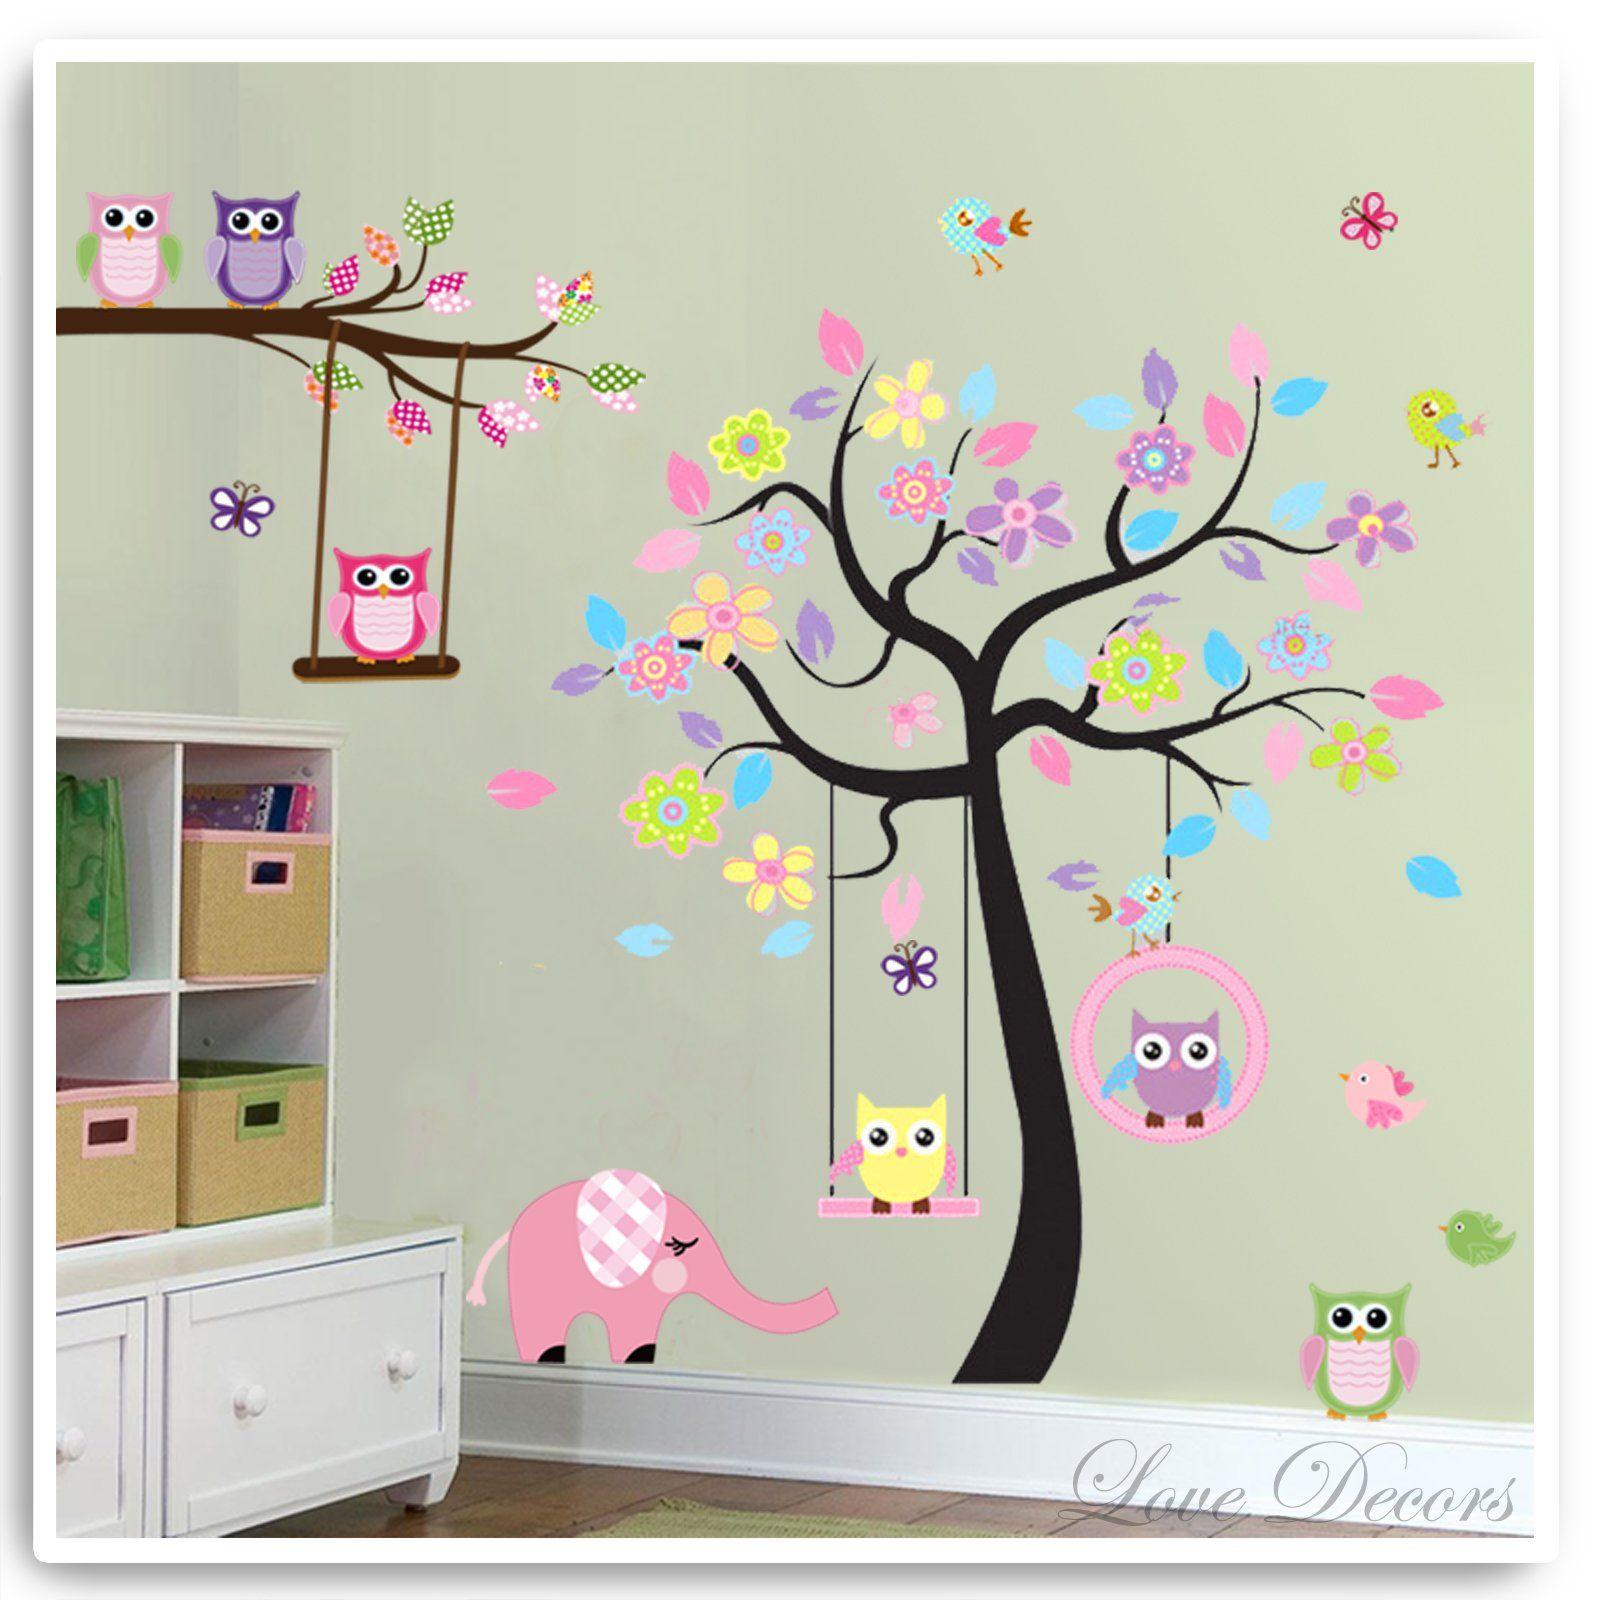 Fun goo adhesivo reutilizable de pared para dormitorio - Dormitorios infantiles diseno ...